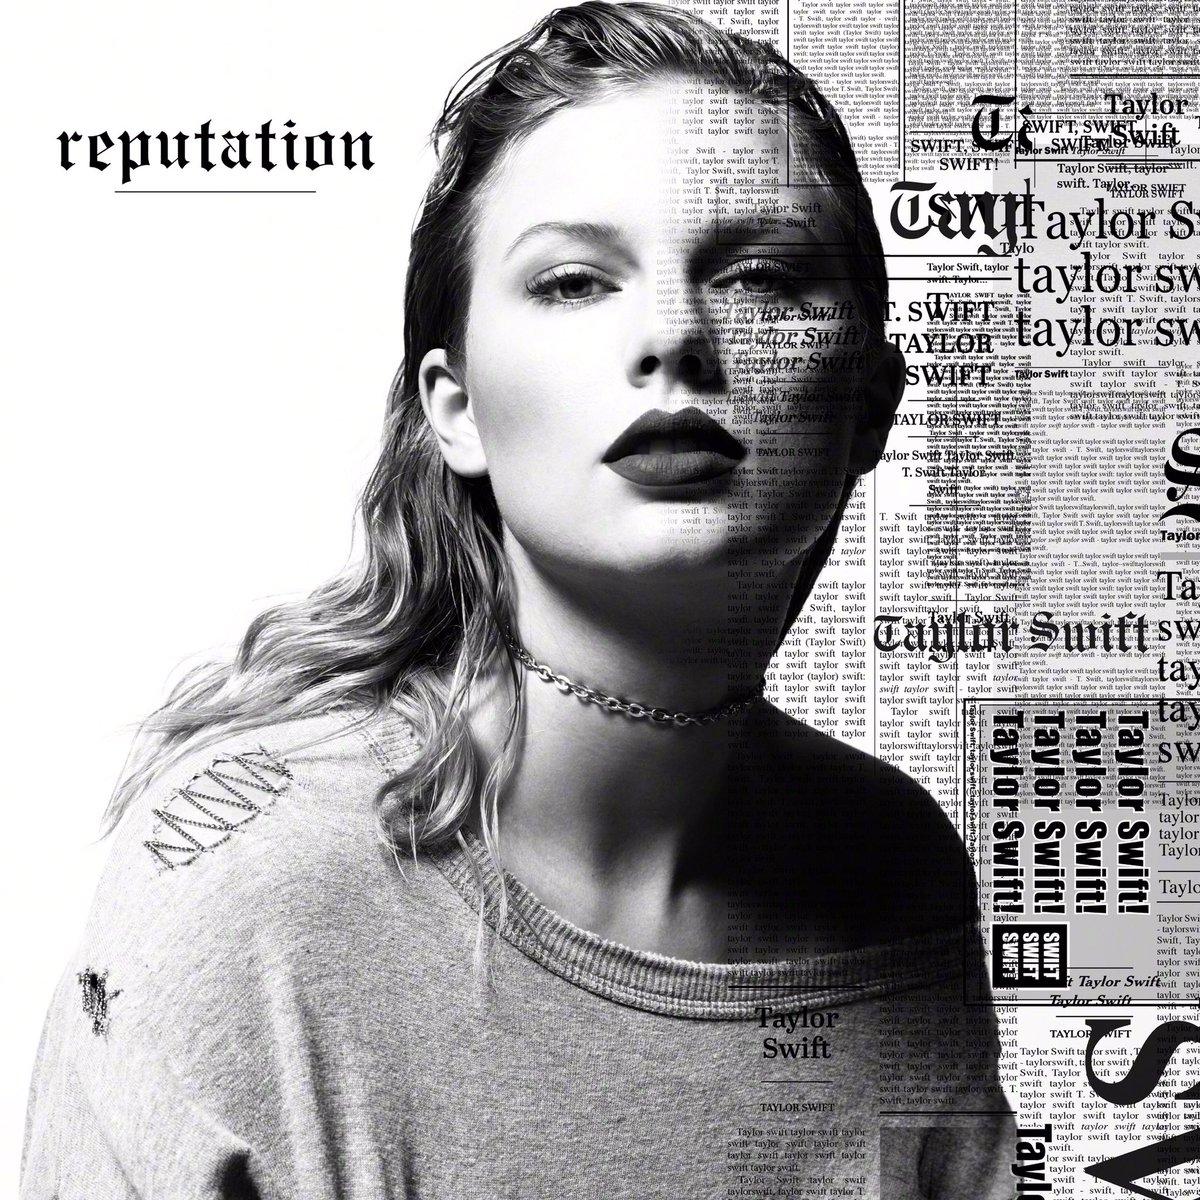 RT @MENGXUAN0112: Retweet to vote for @taylorswift13's reputation for Favorite Album Pop/Rock! 🎧 #AMAs  https://t.co/8Liz9ZKNPE